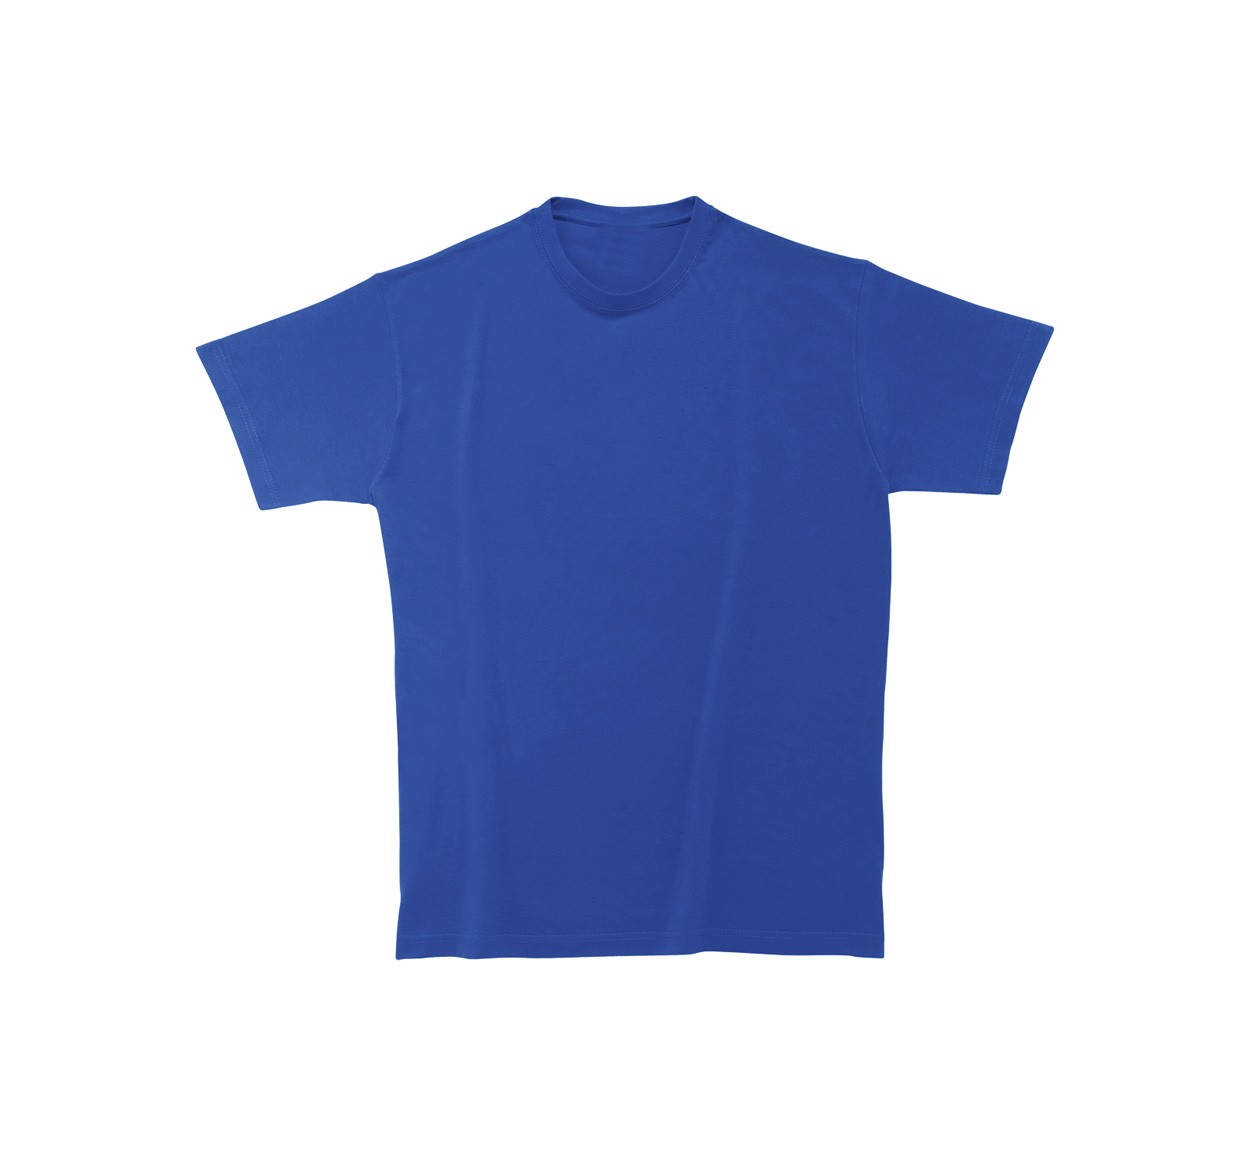 Tričko Heavy Cotton - Modrá / M